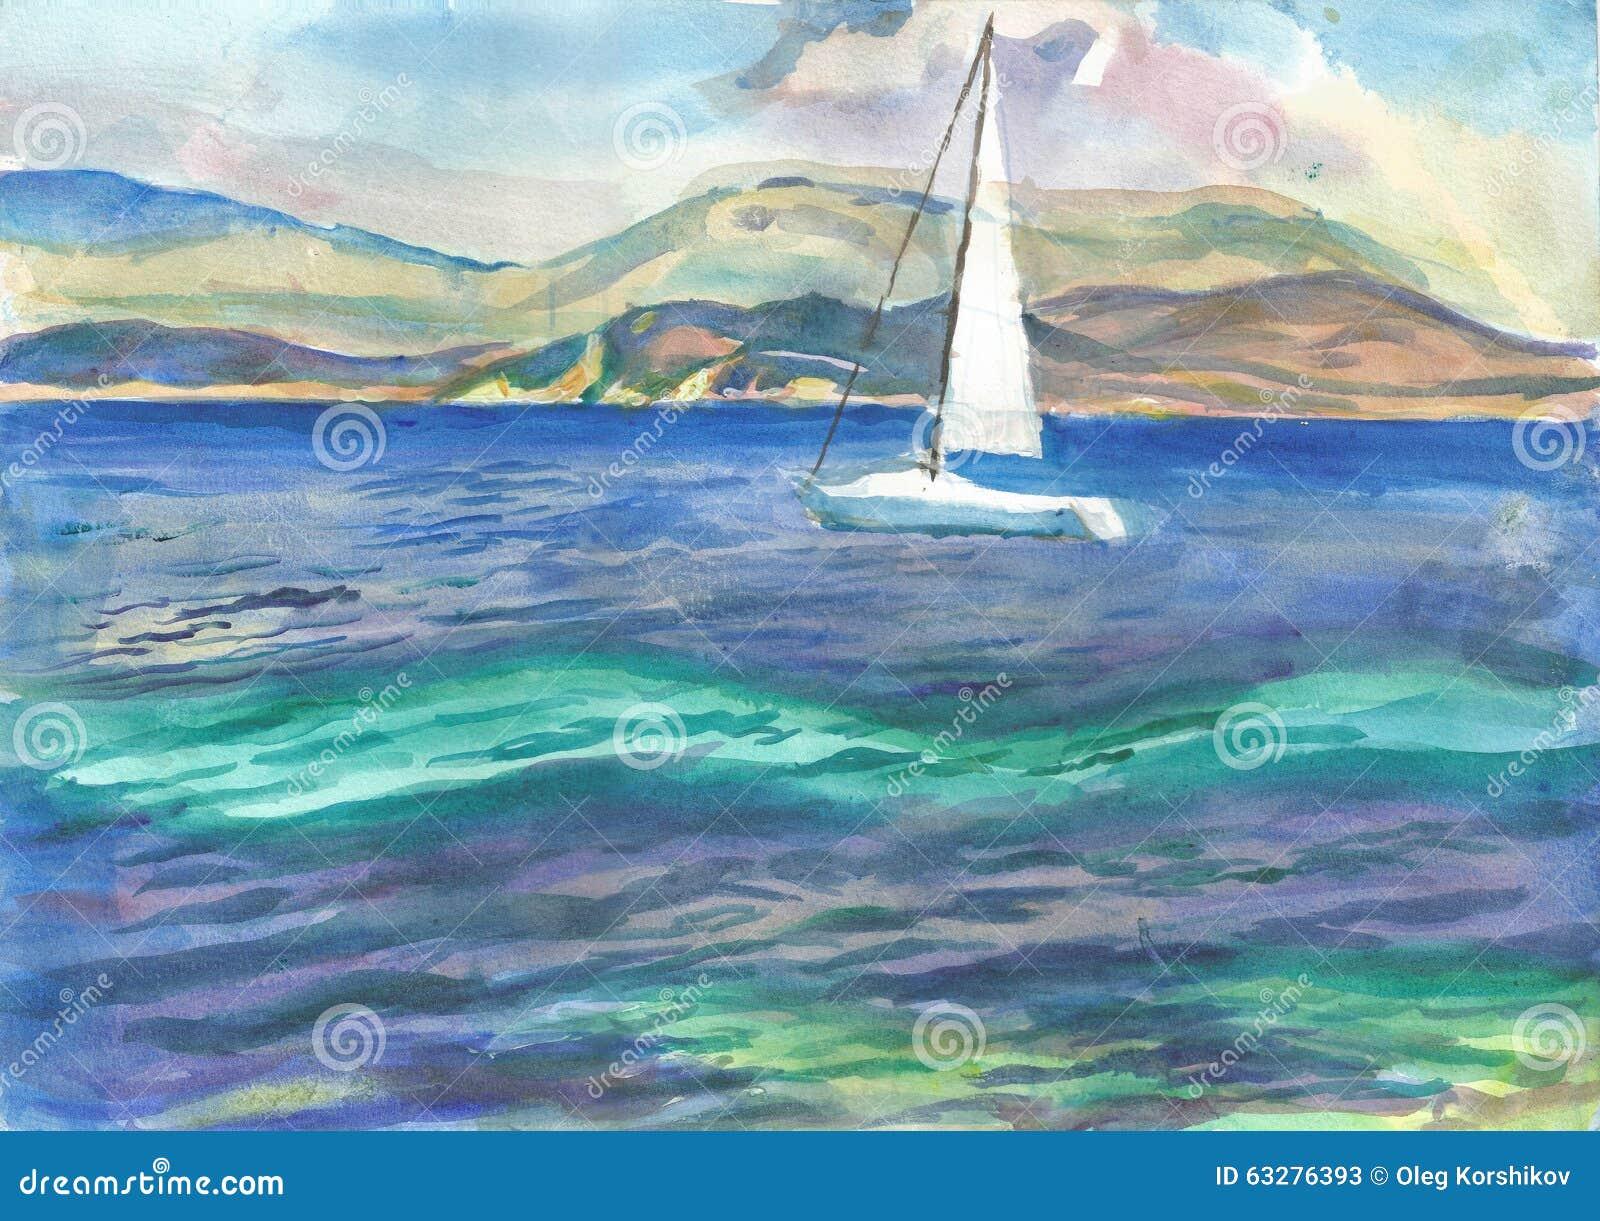 blue sea greece related-#31